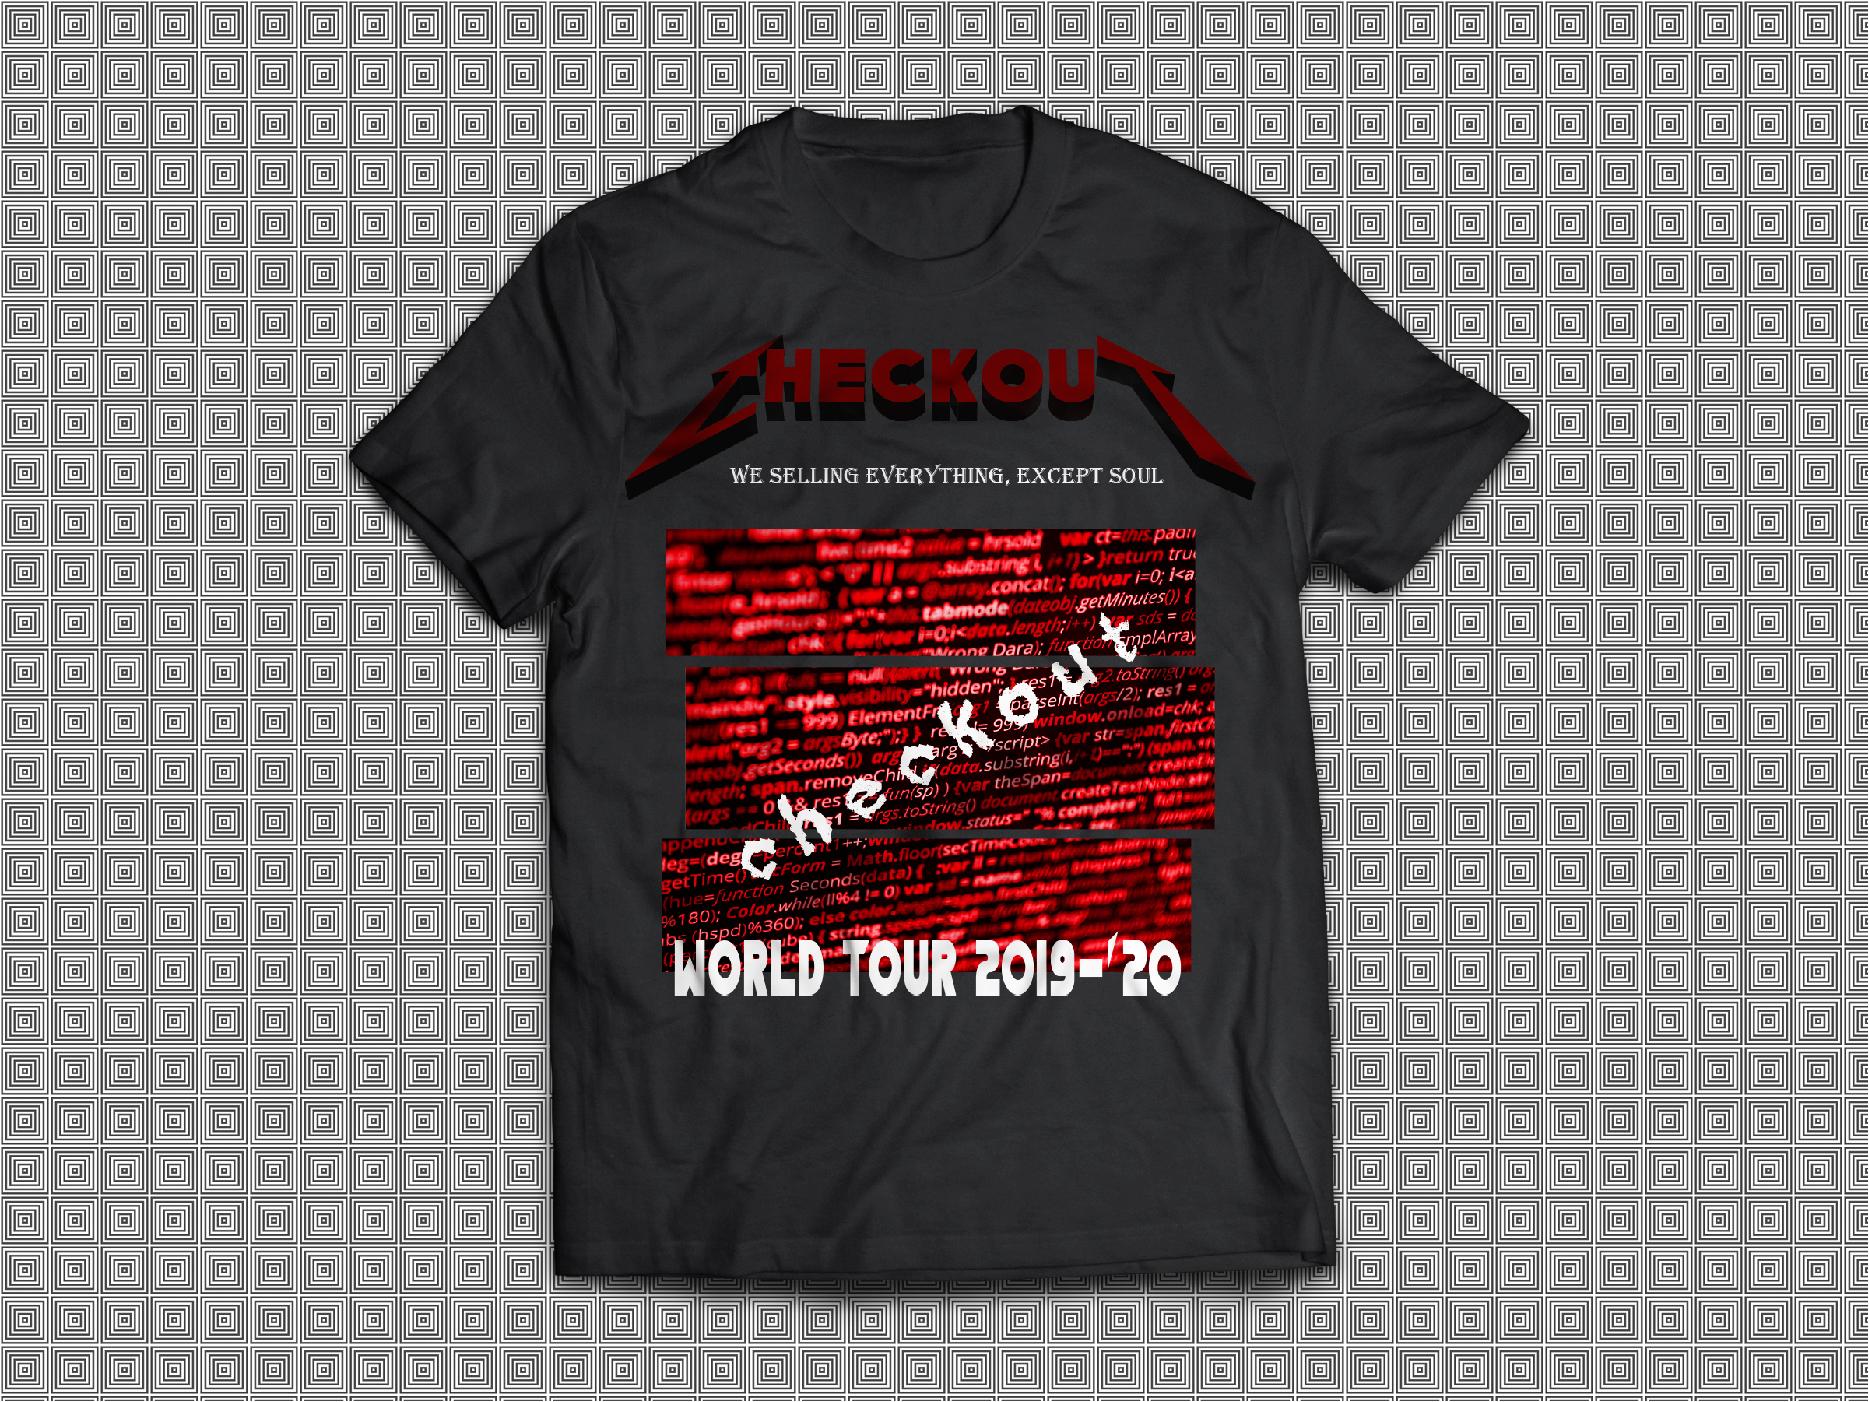 Дизайн футболки/худи для It-команды фото f_4185e43b91391d9a.jpg